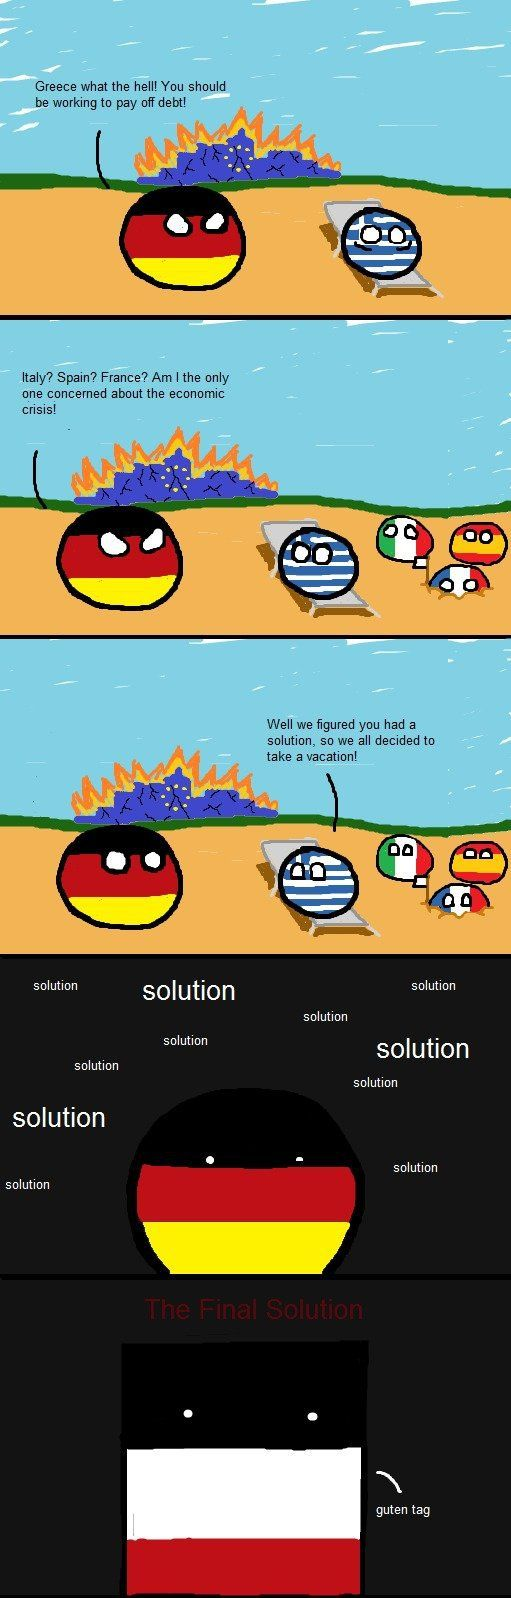 final solution LocoPengu - Why so serious? witze meme lustiges zitate humor funny bilder